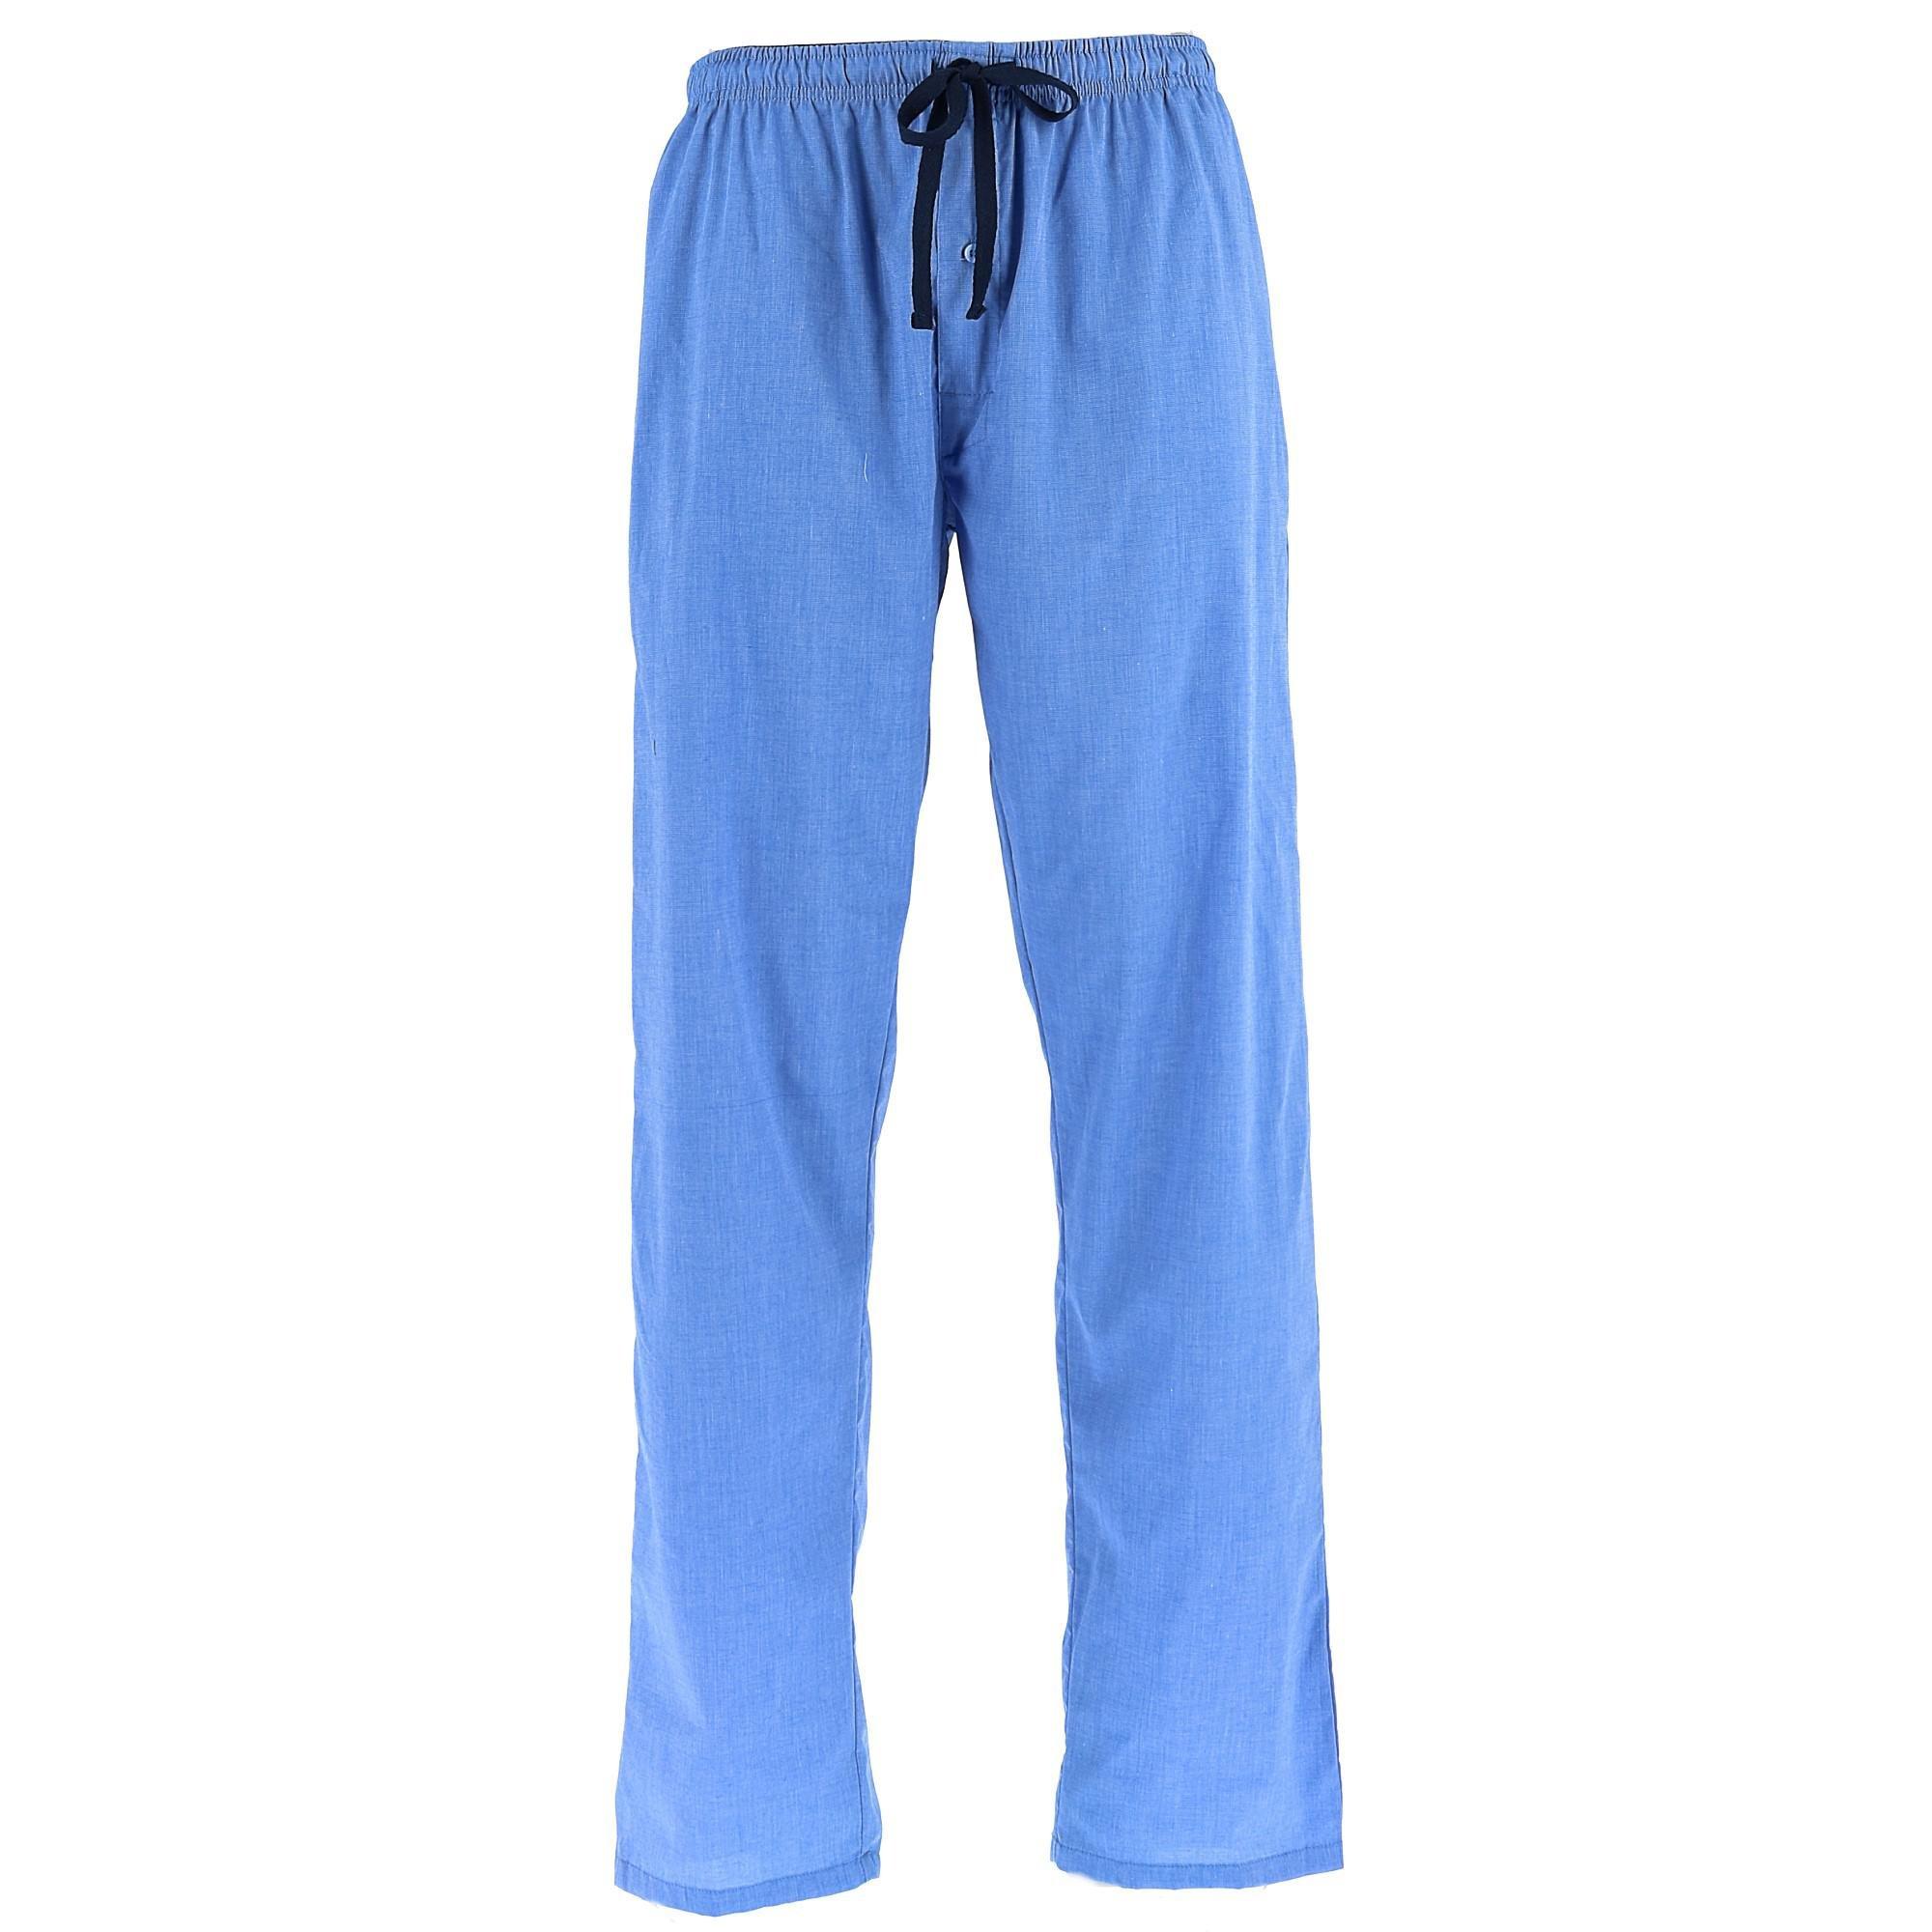 Hanes Men's Tall Size Woven Lounge Pajama Pants, XLT, Blue